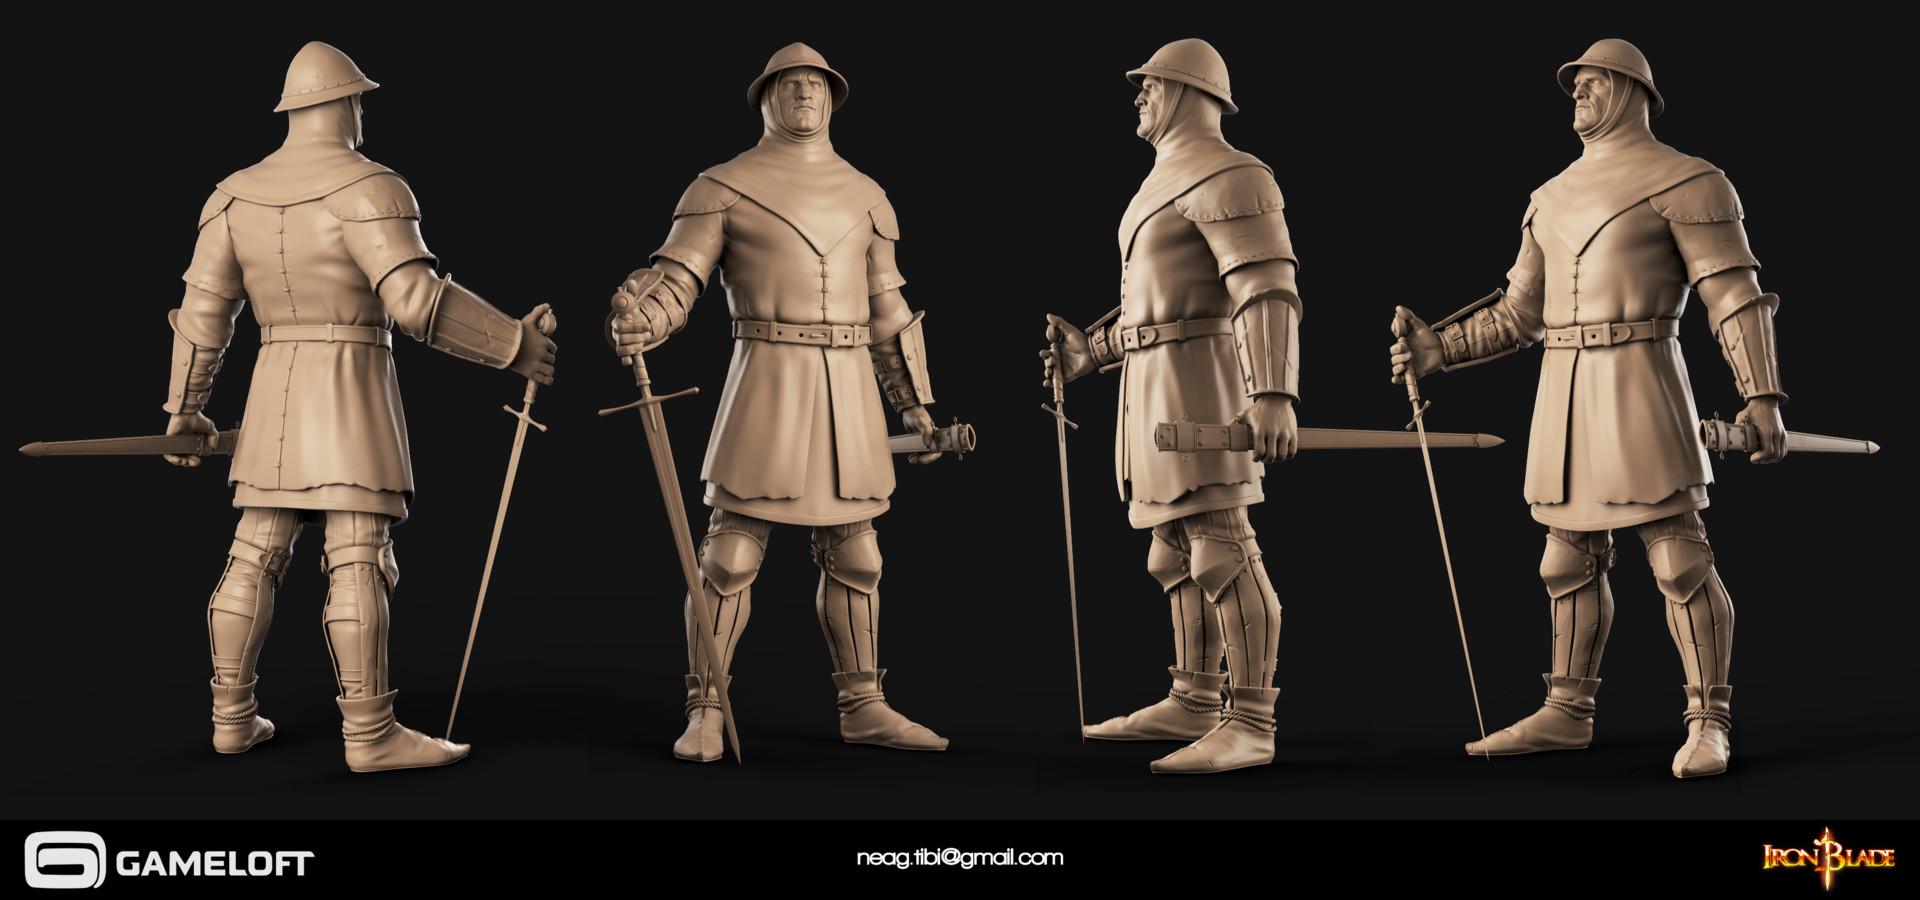 Tibi neag tibi neag iron blade garrison soldier c high poly